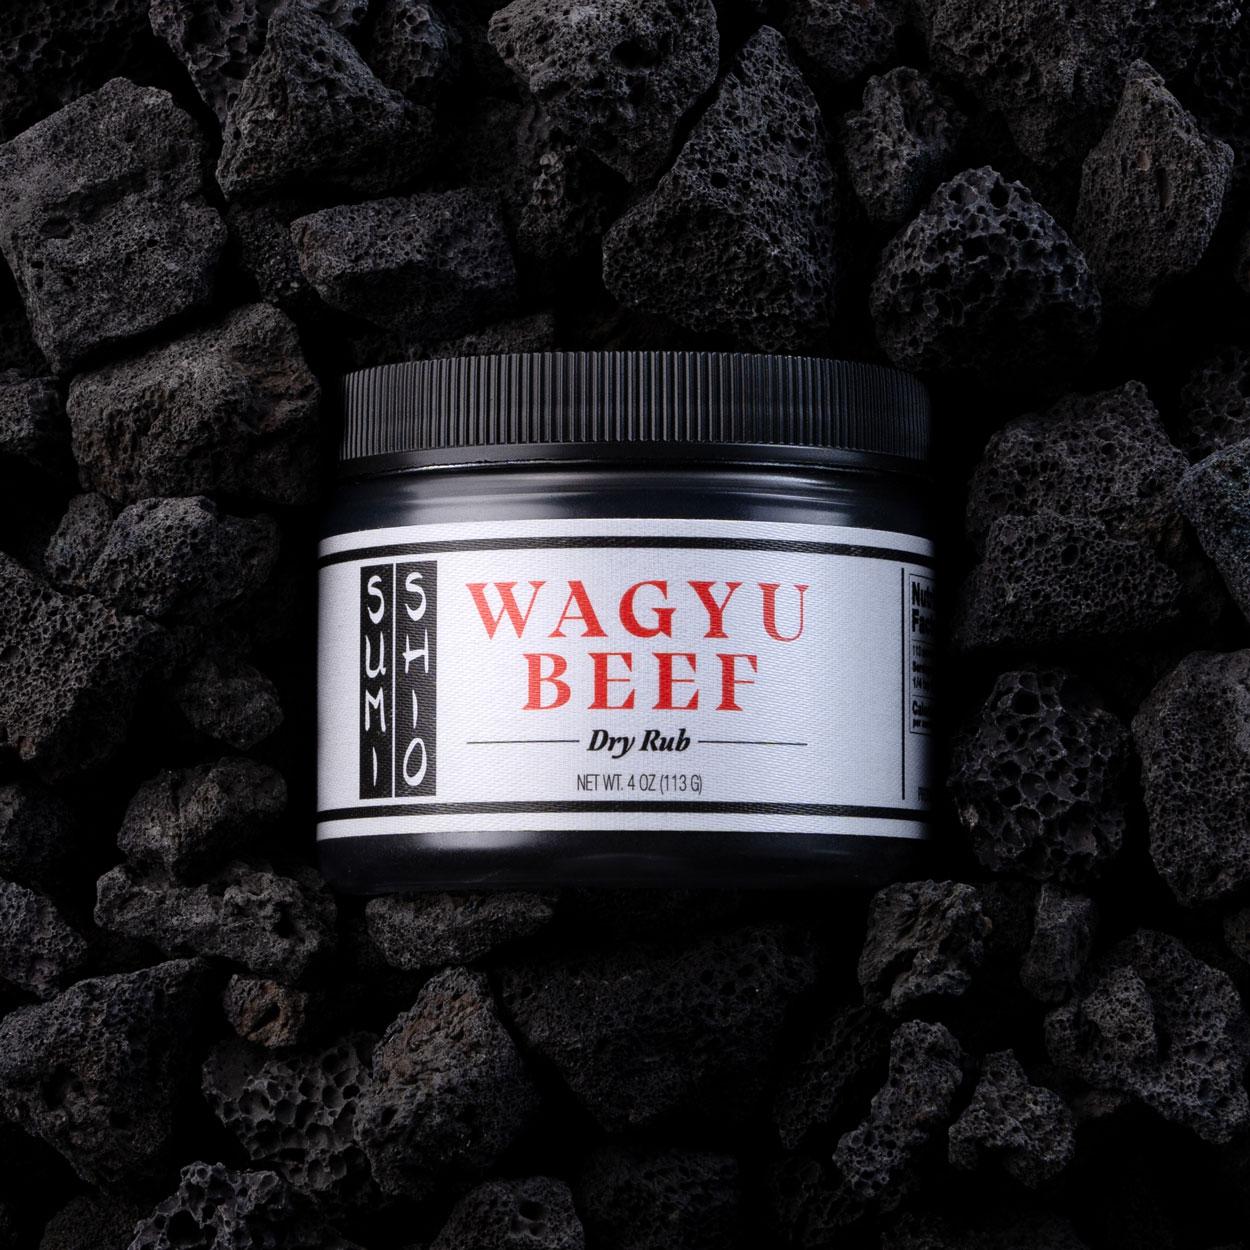 Sumi Shio Wagyu Beef Dry Rub Picture